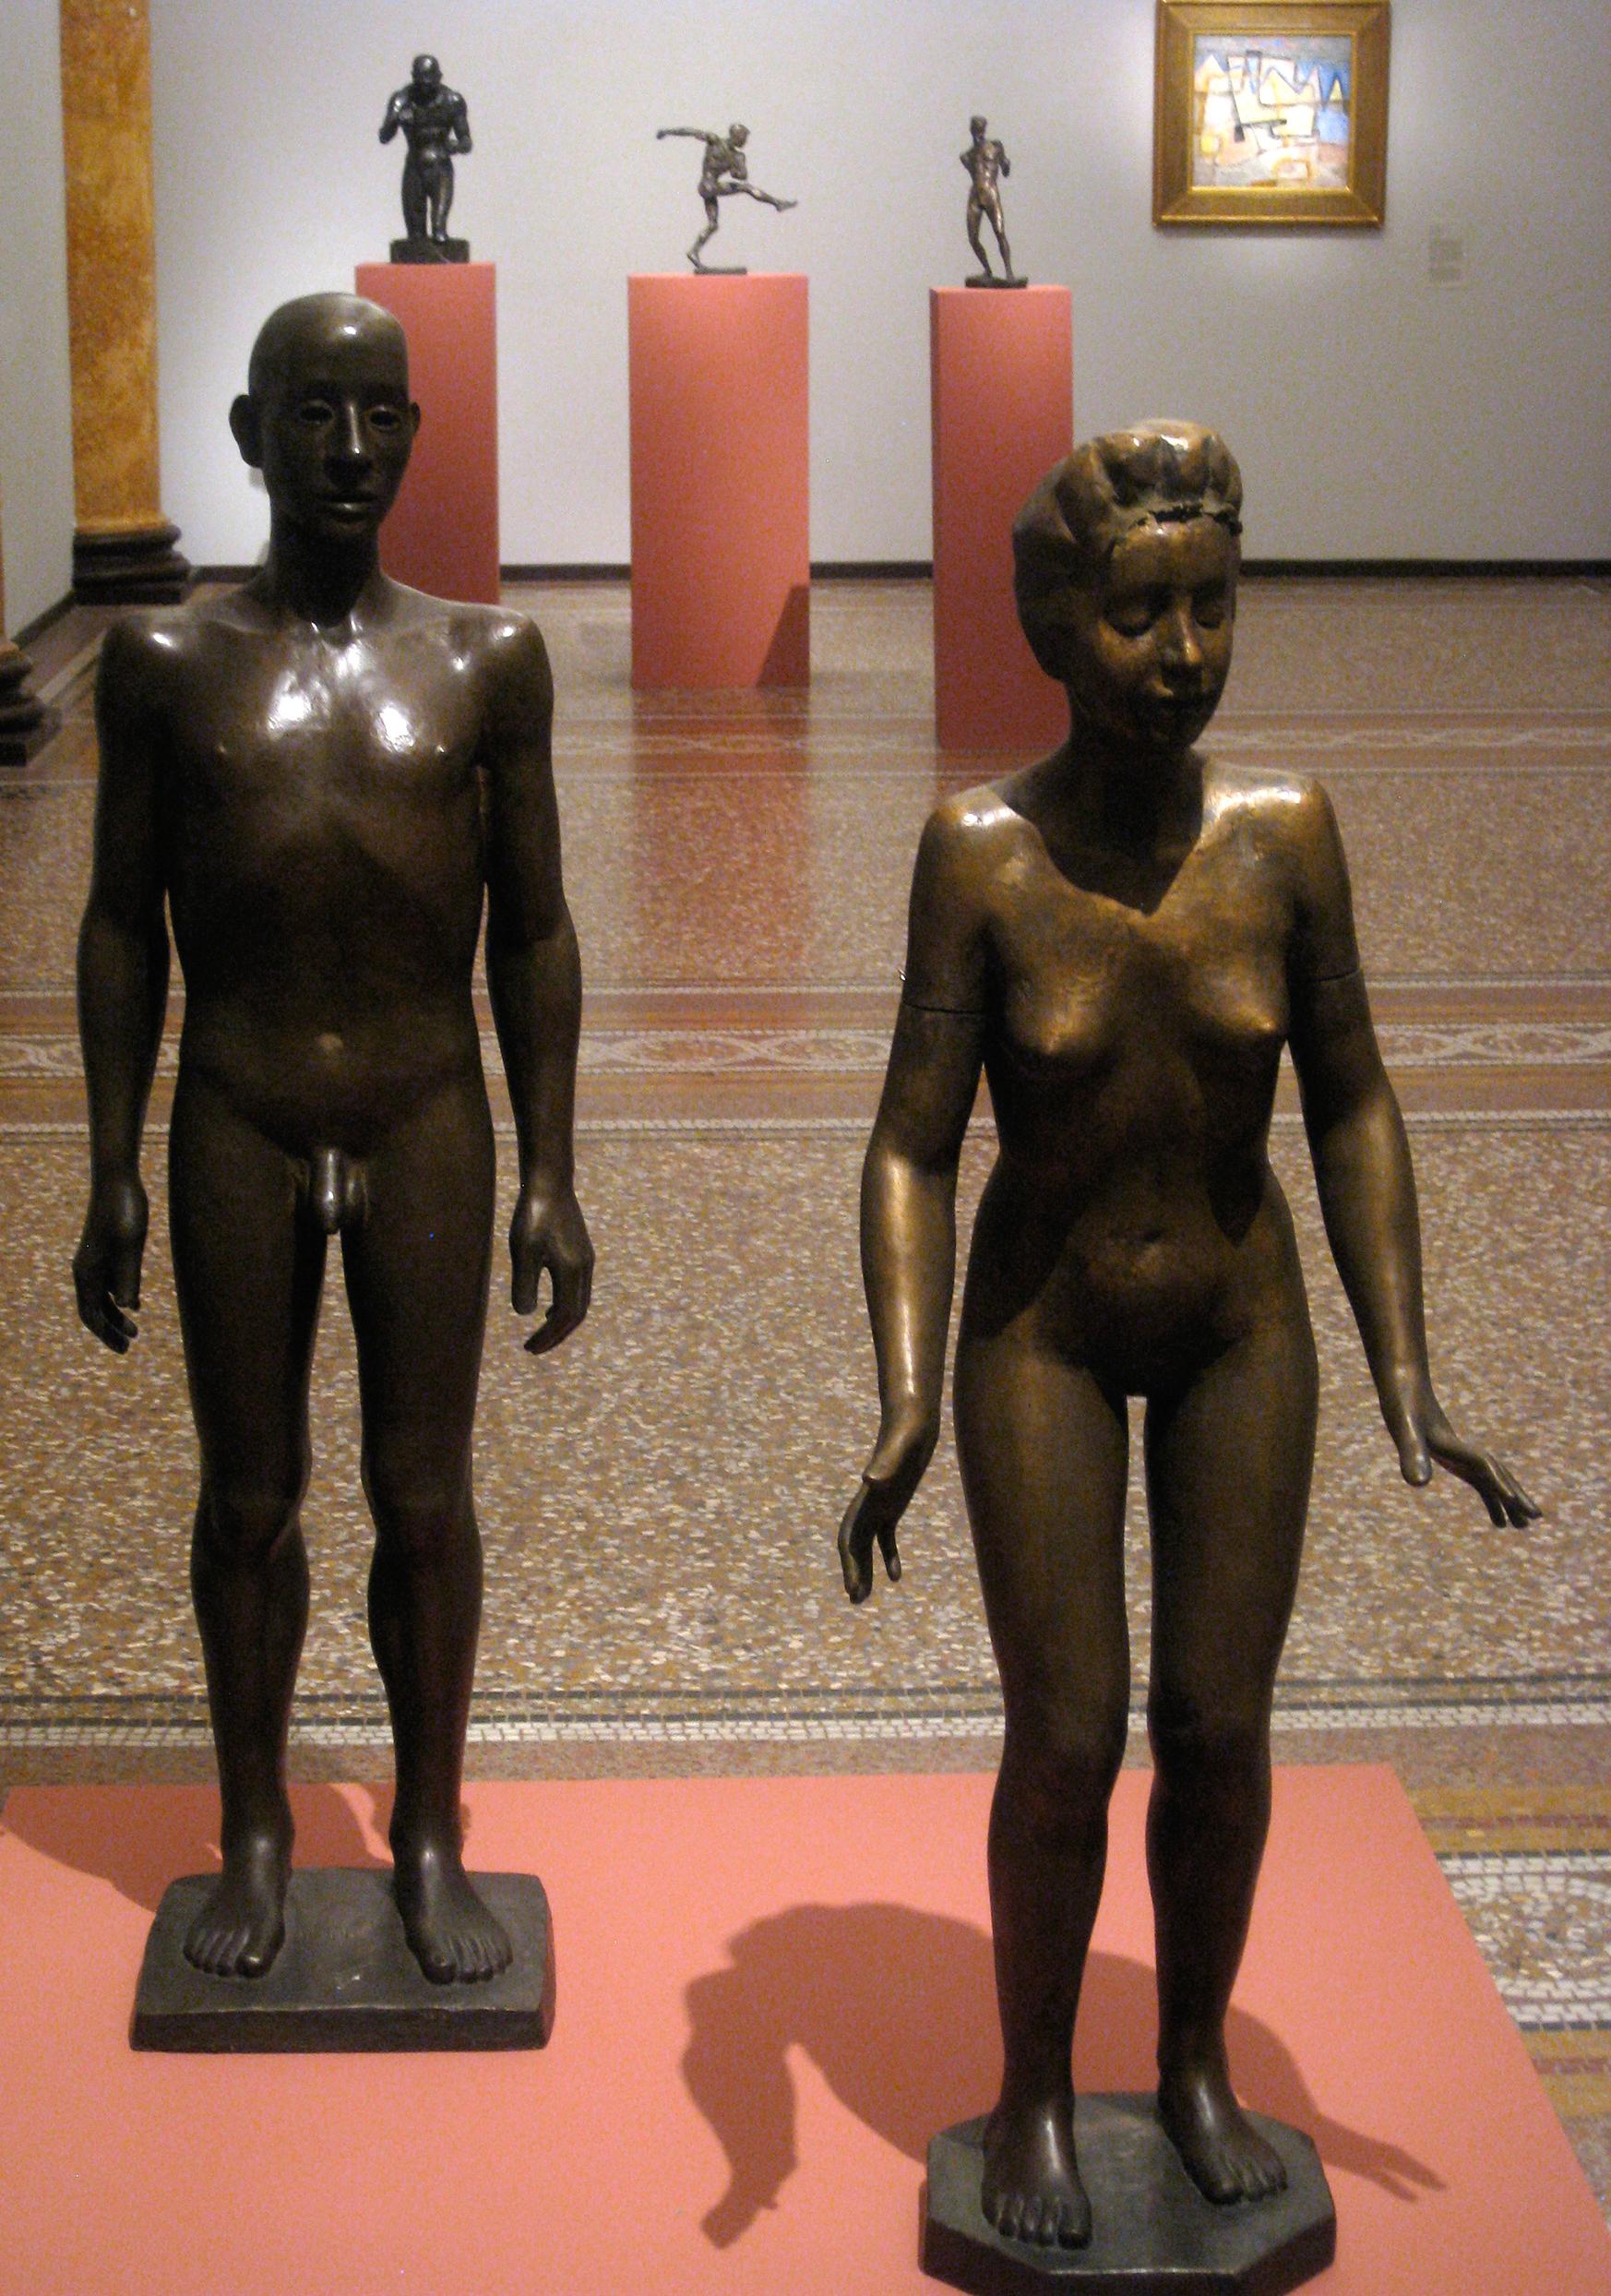 Hamburger Kunsthalle, Provenienzforschung, Flechtheim, Ausstellung, Dokumentationsfoto, Figuren, Bronze